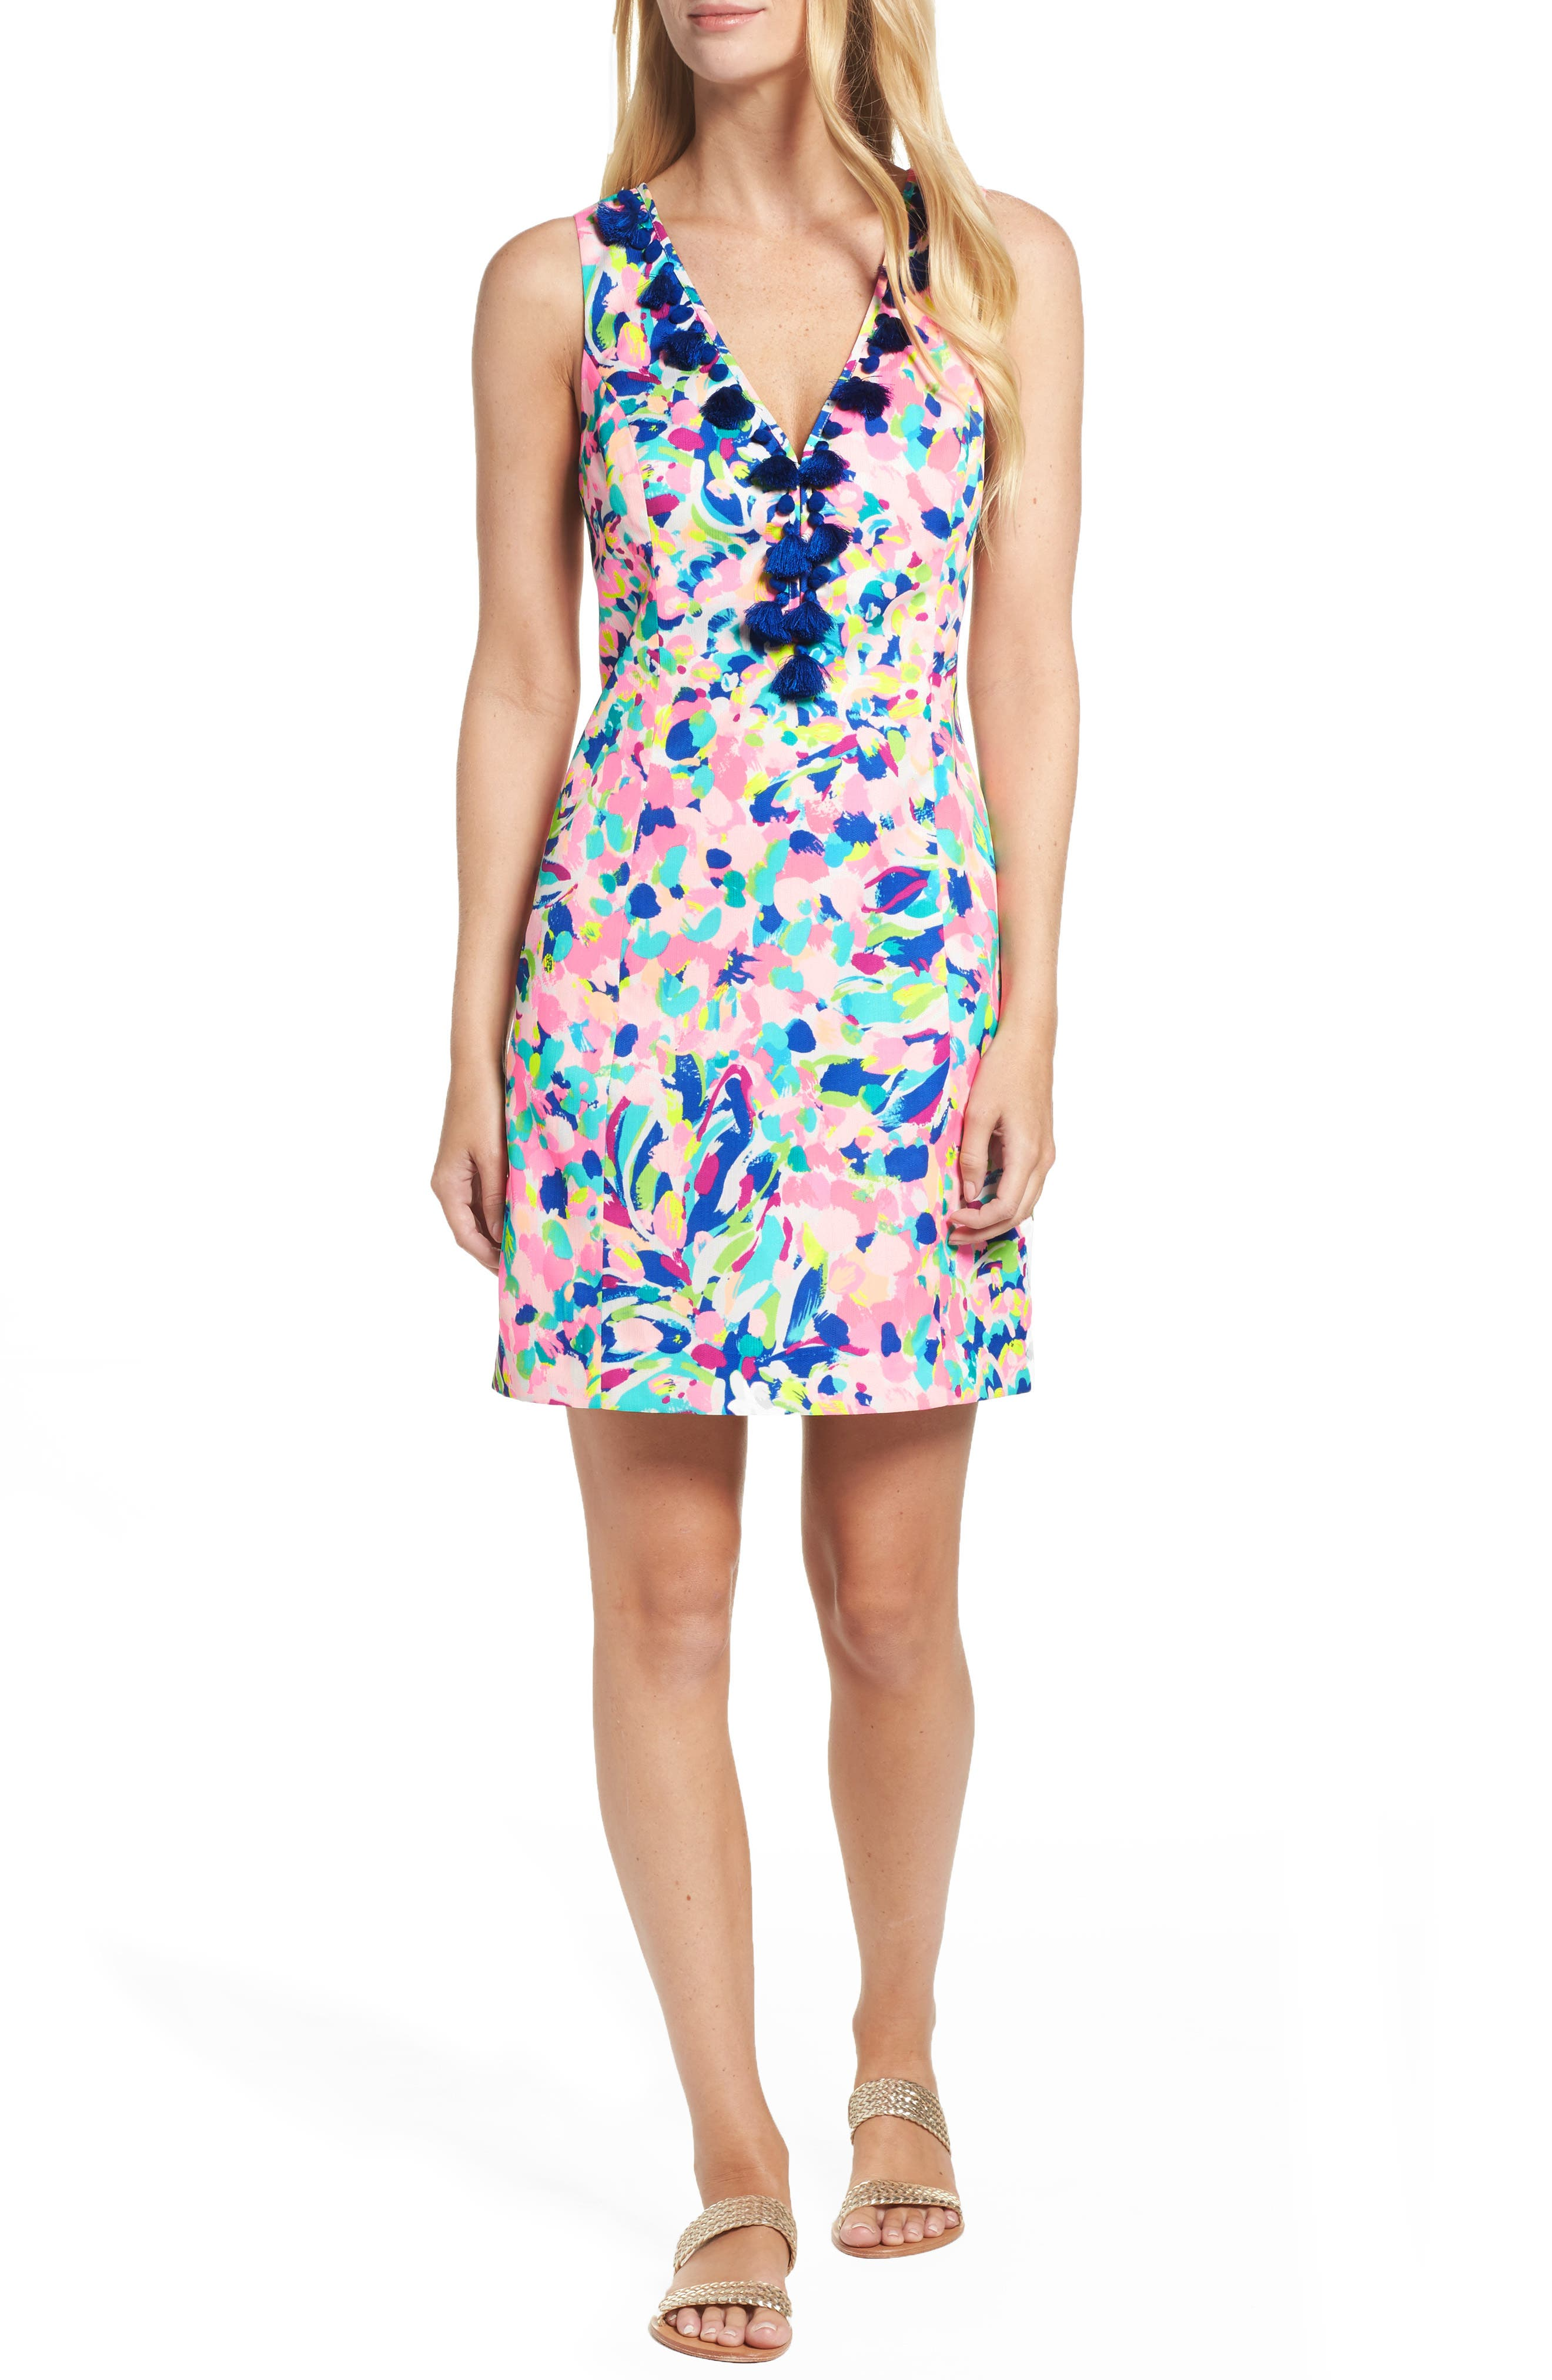 Cabrey Sheath Dress,                             Main thumbnail 1, color,                             Multi Pina Colada Club